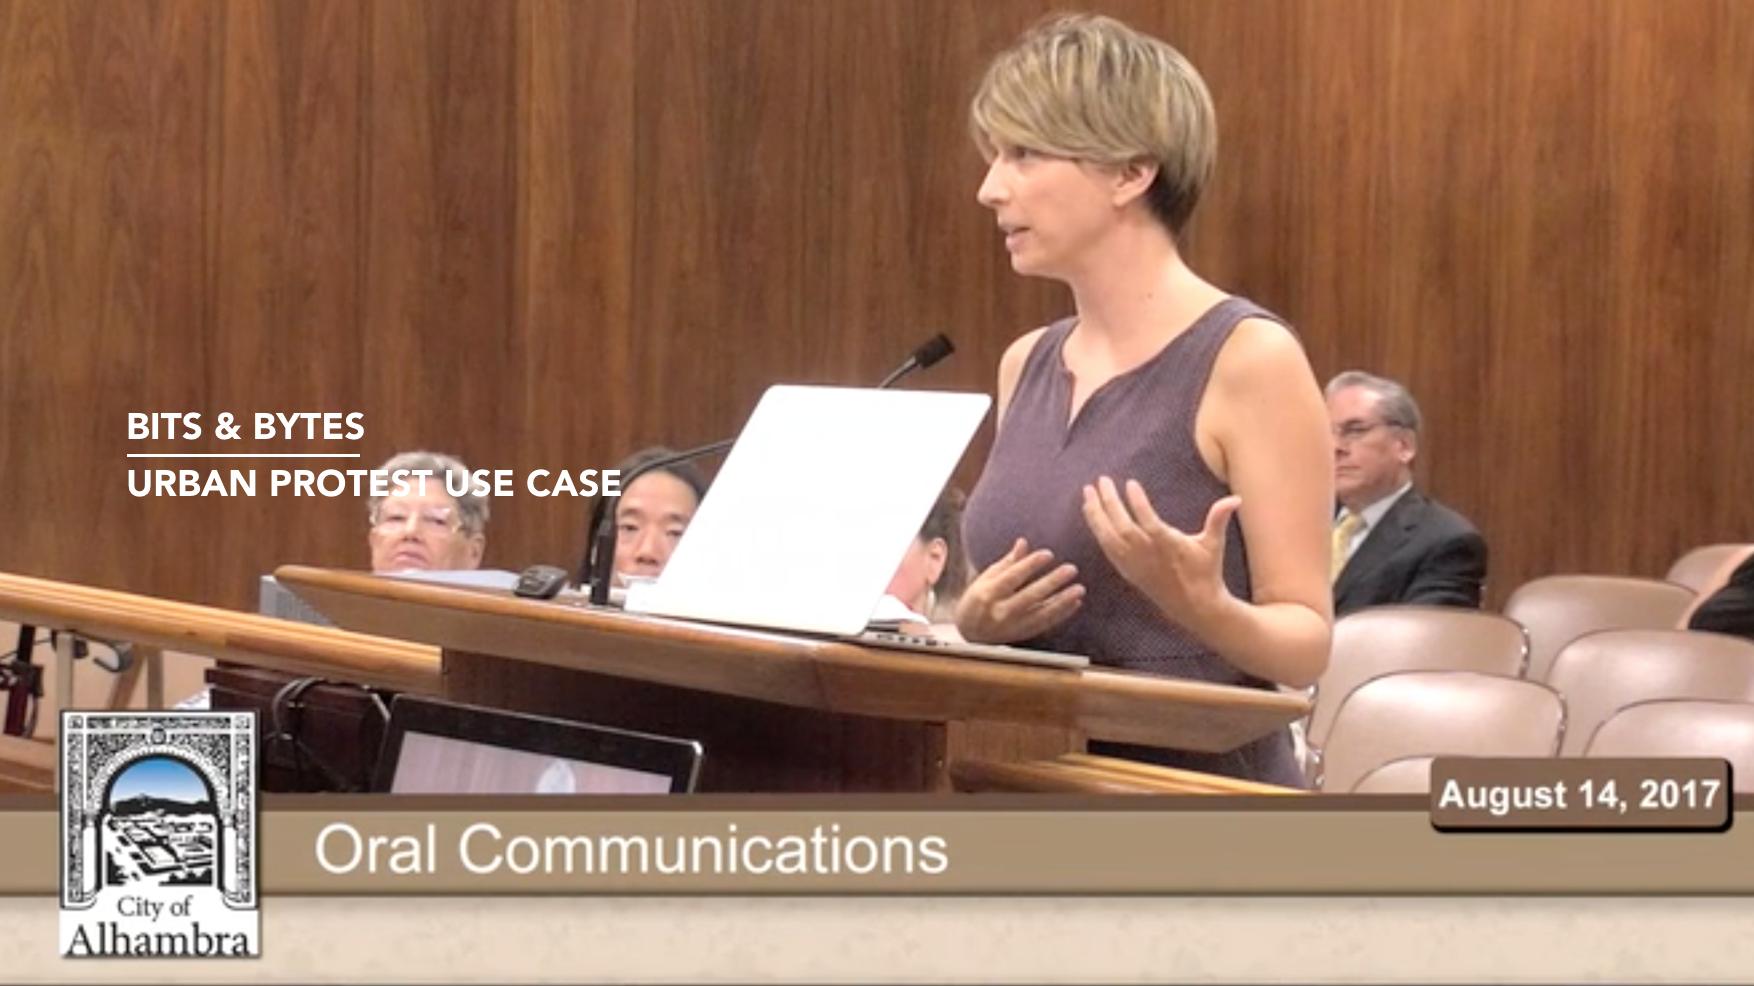 Presenting Virtual Protestors at the Alhambra City Council meeting -